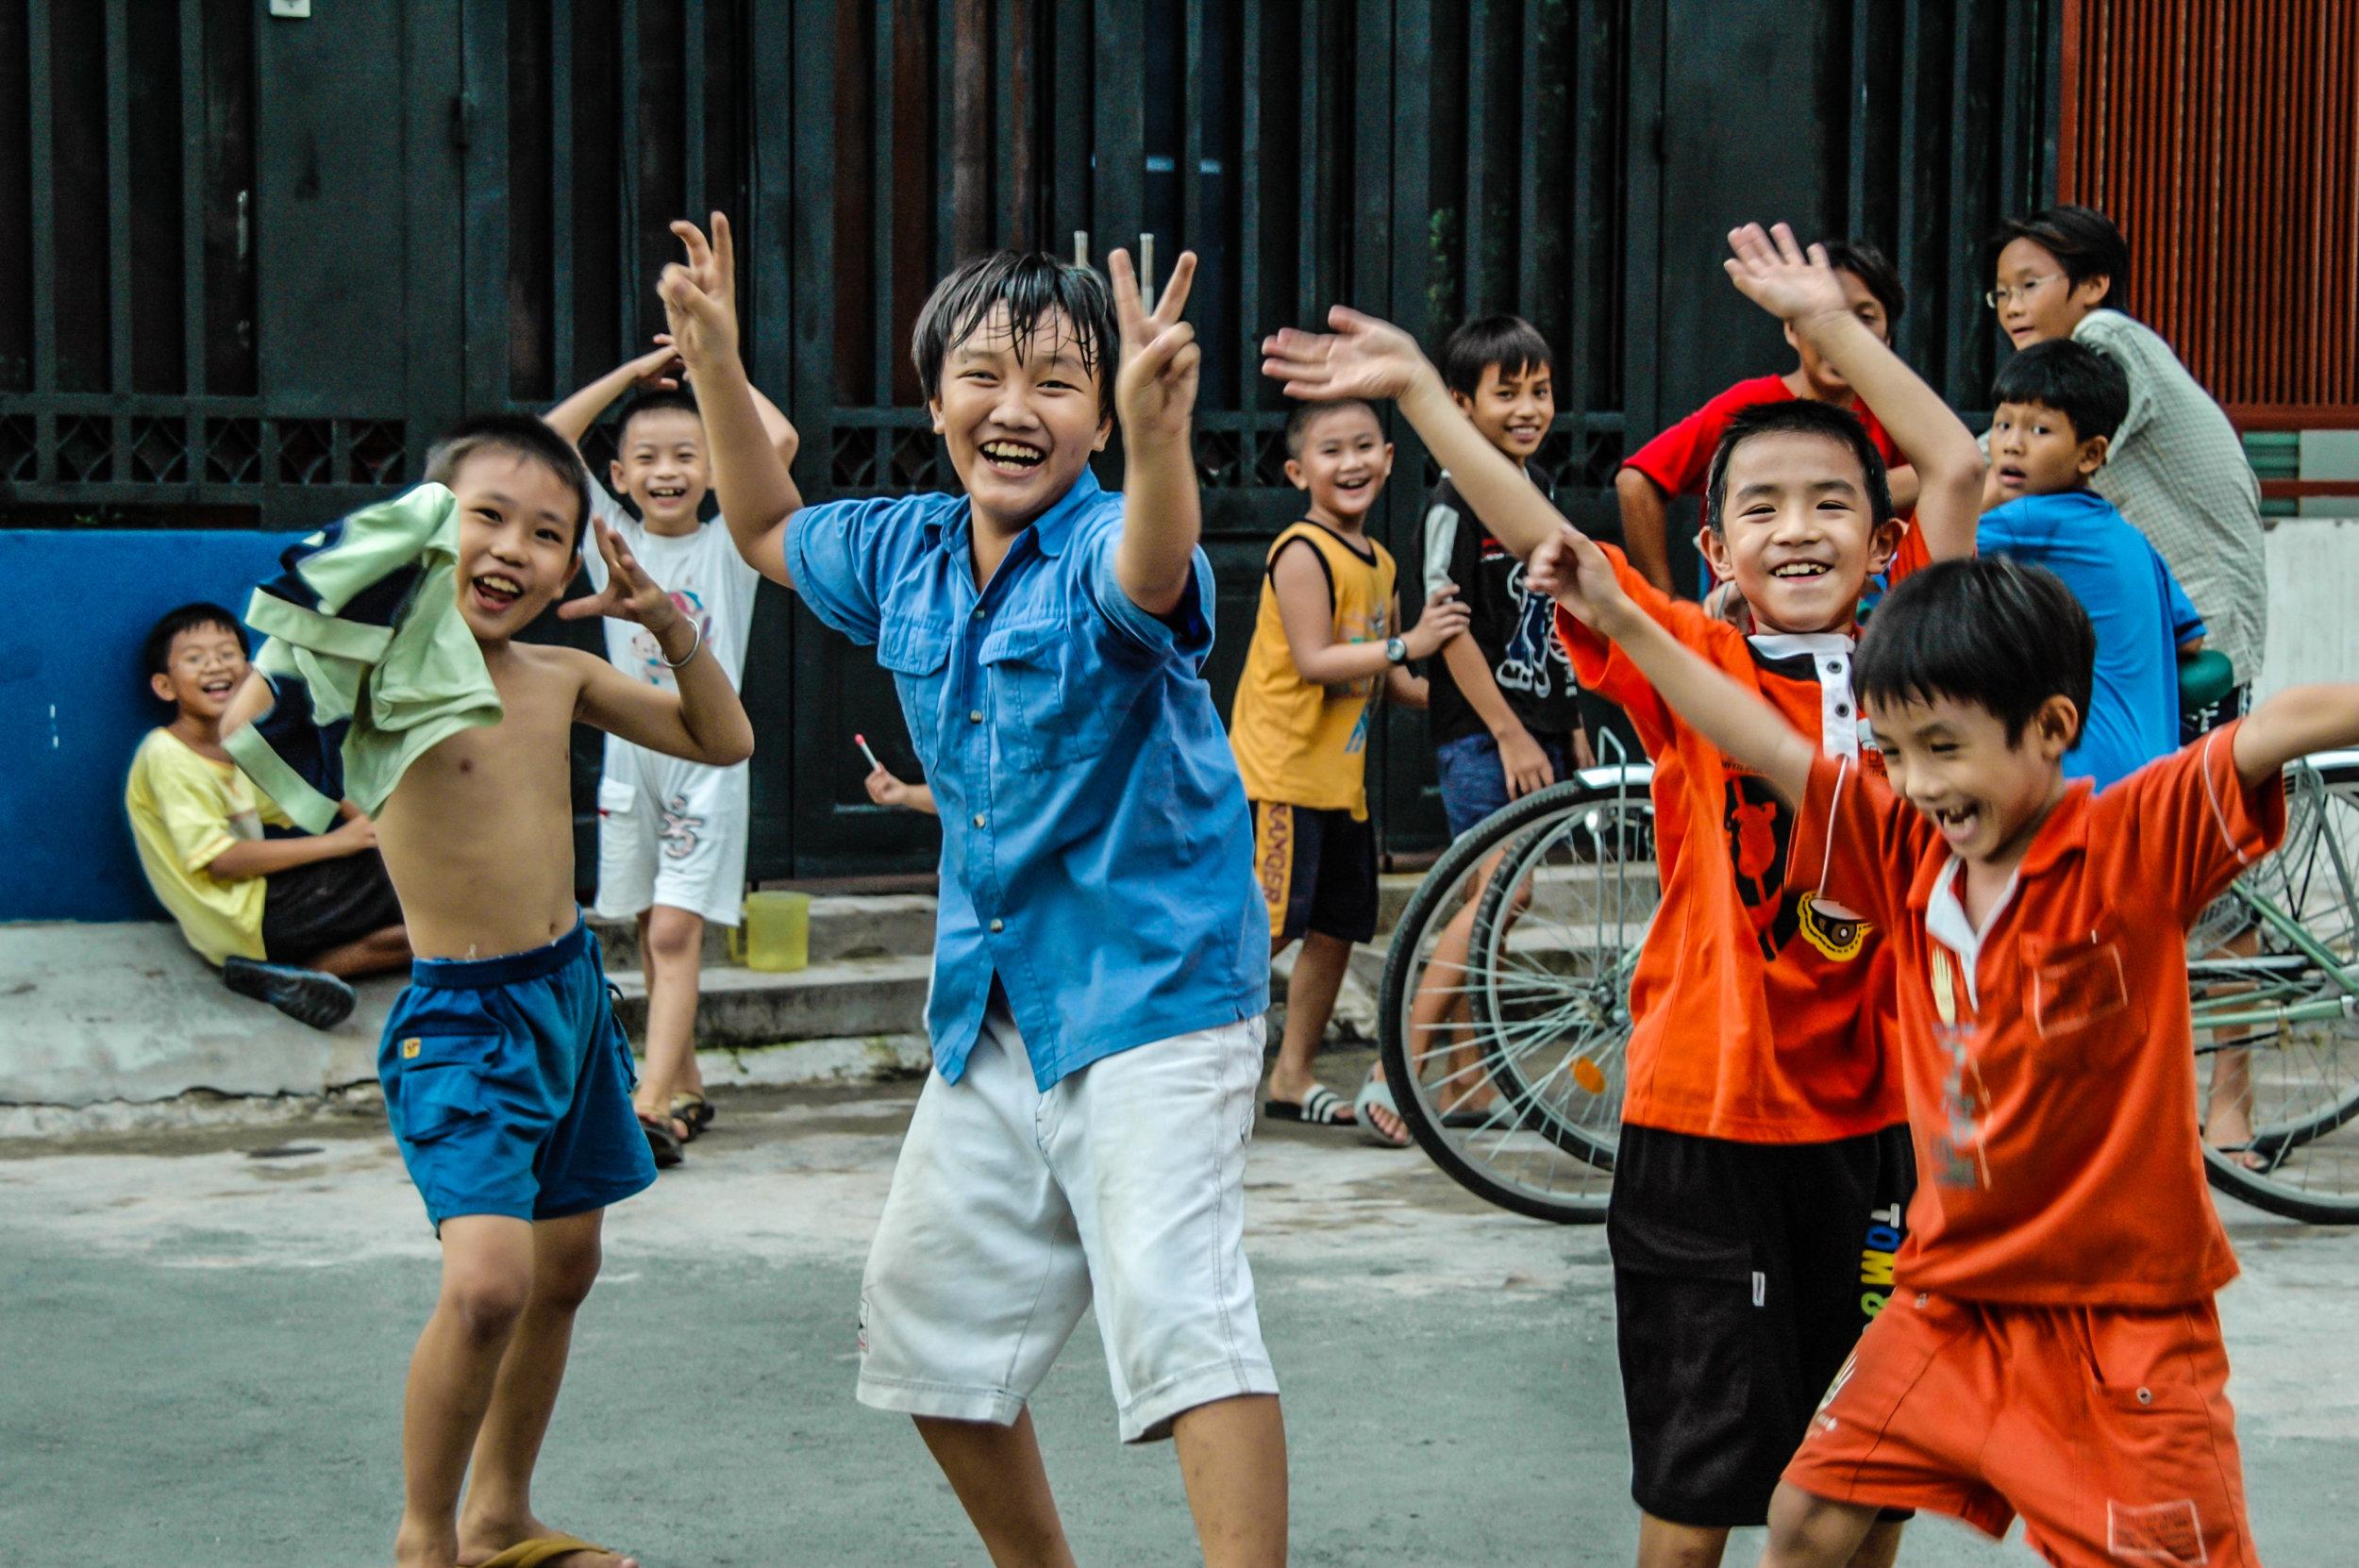 PeopleofVietnam-100.jpg